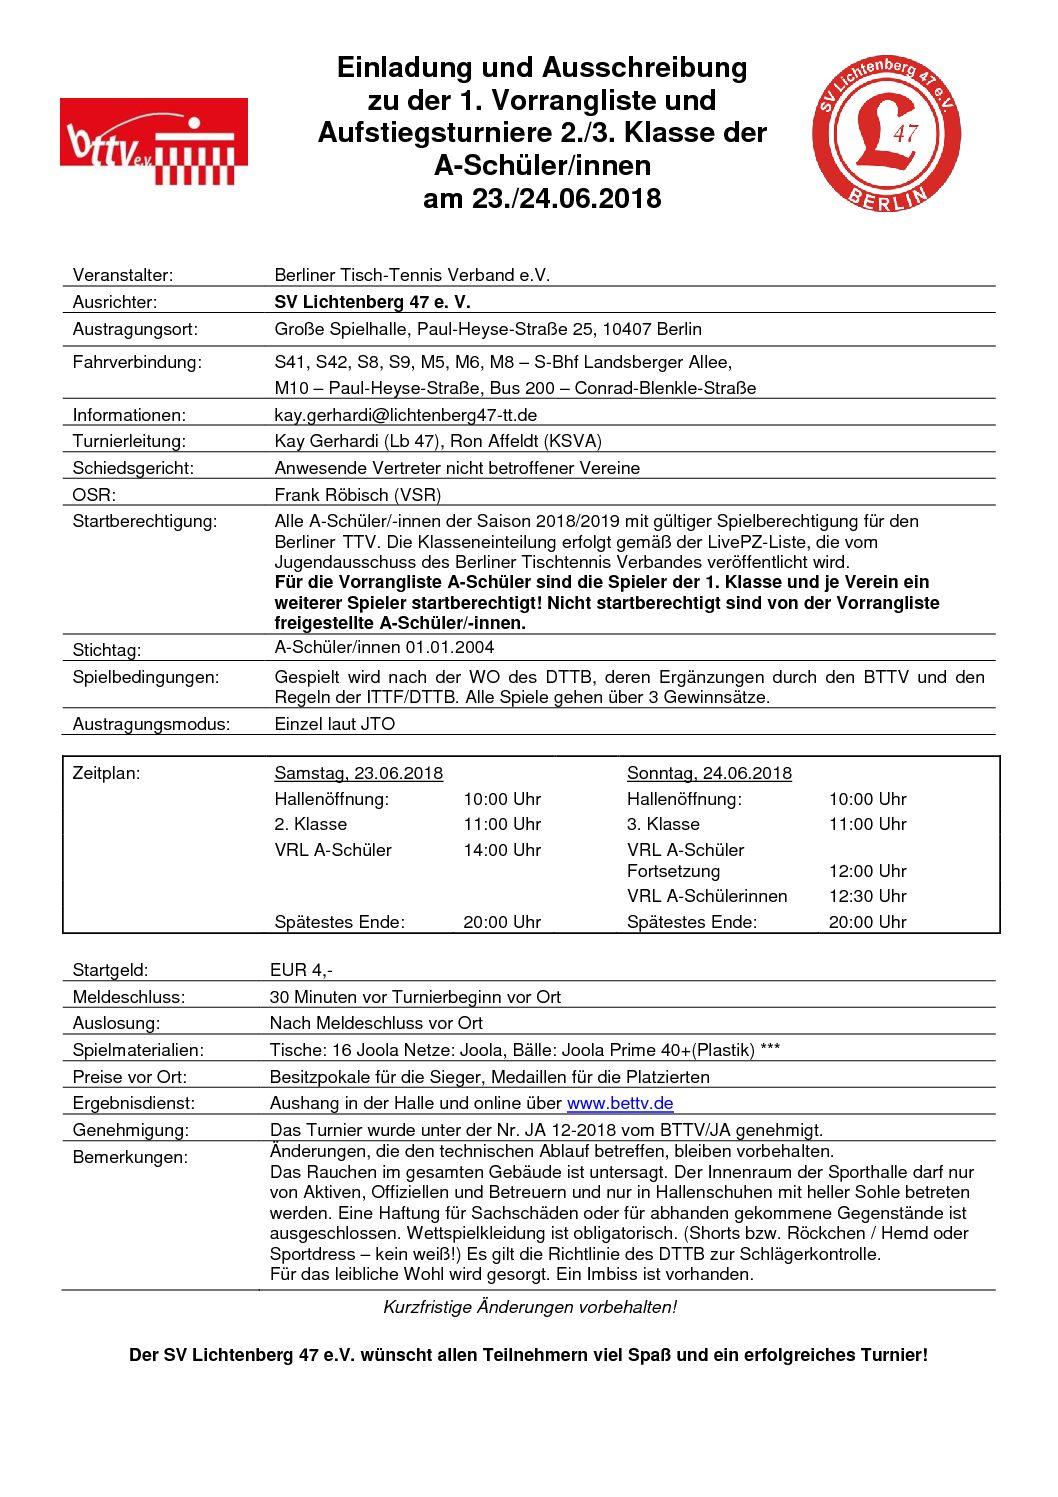 Ausschreibung 1. VRL und AT 2018 A-Schüler/innen